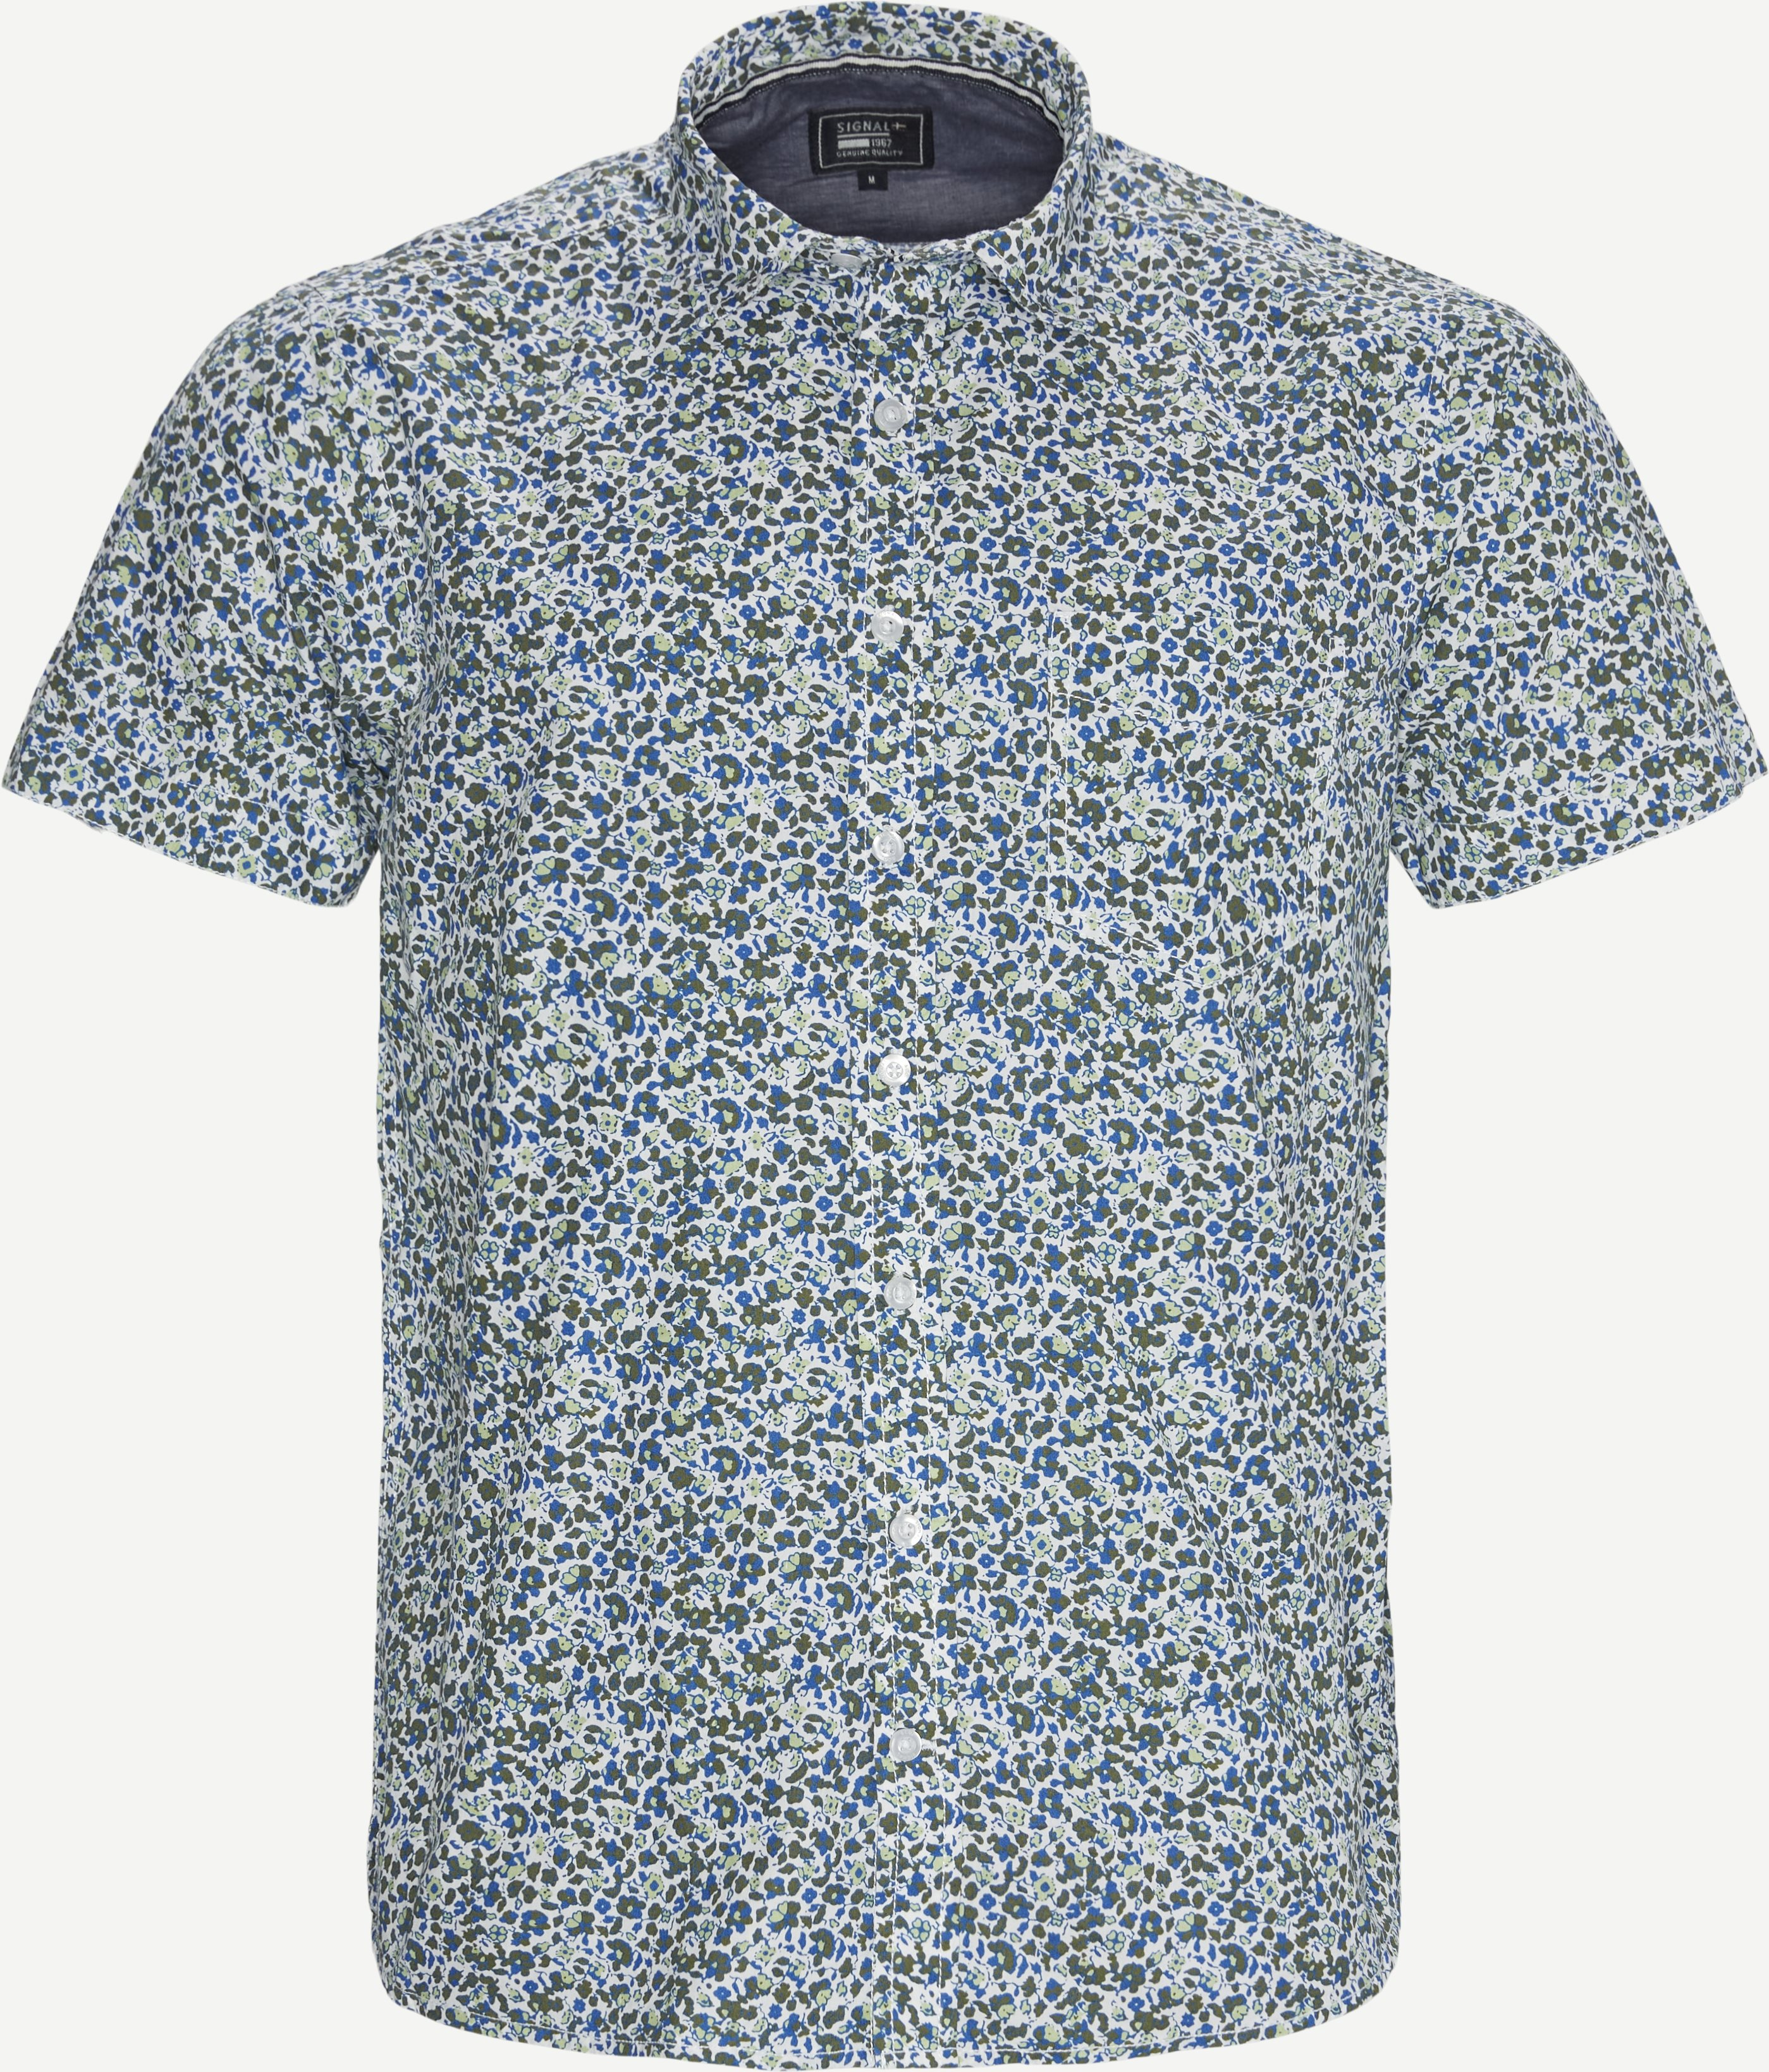 Arthur K/Æ Skjorte - Short-sleeved shirts - Regular - Army